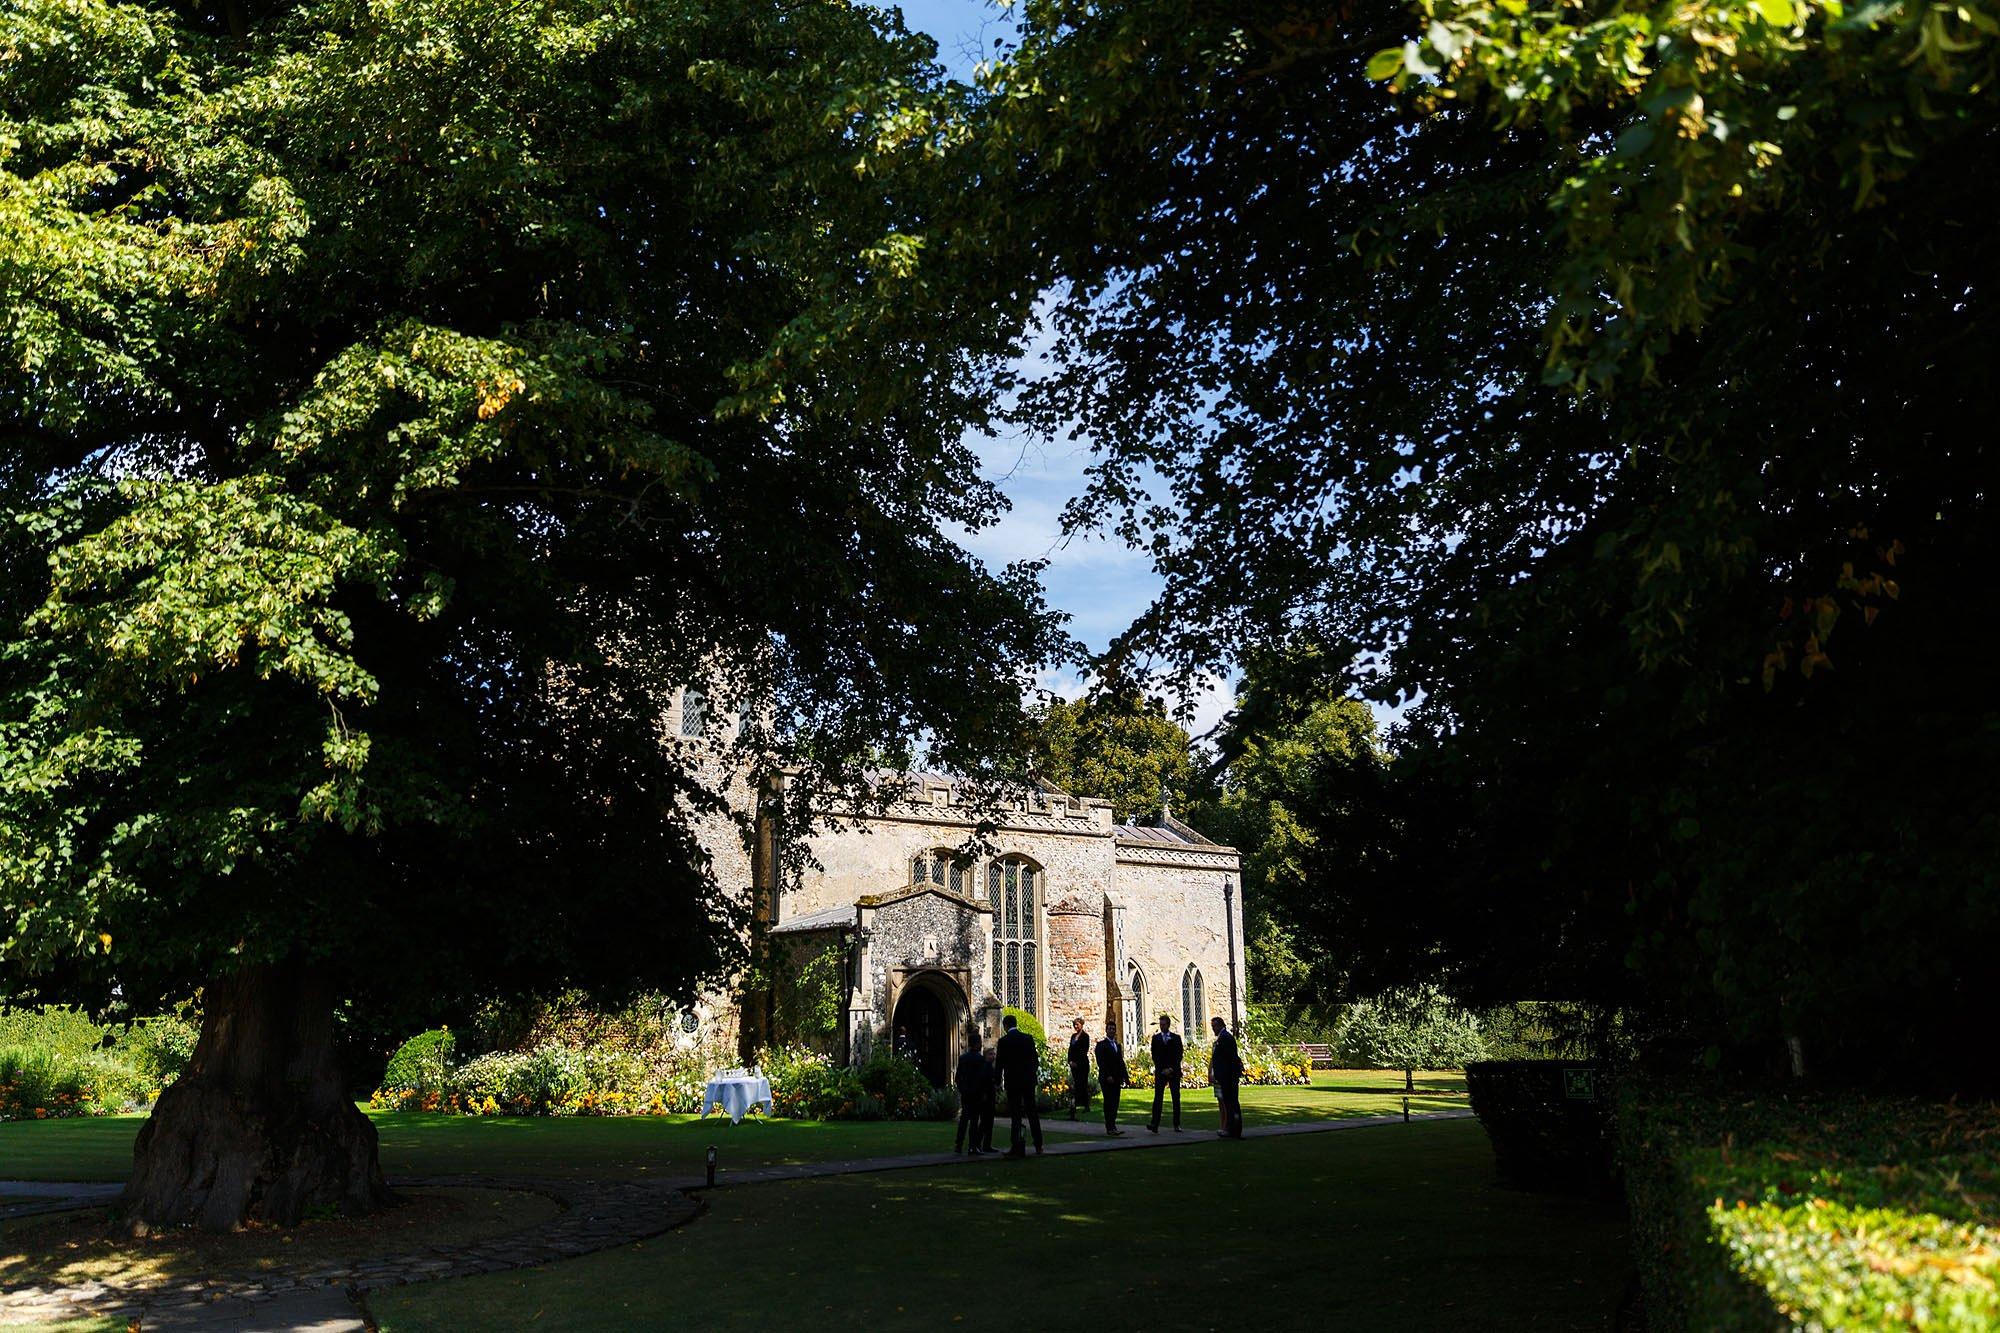 Hengrave wedding chapel